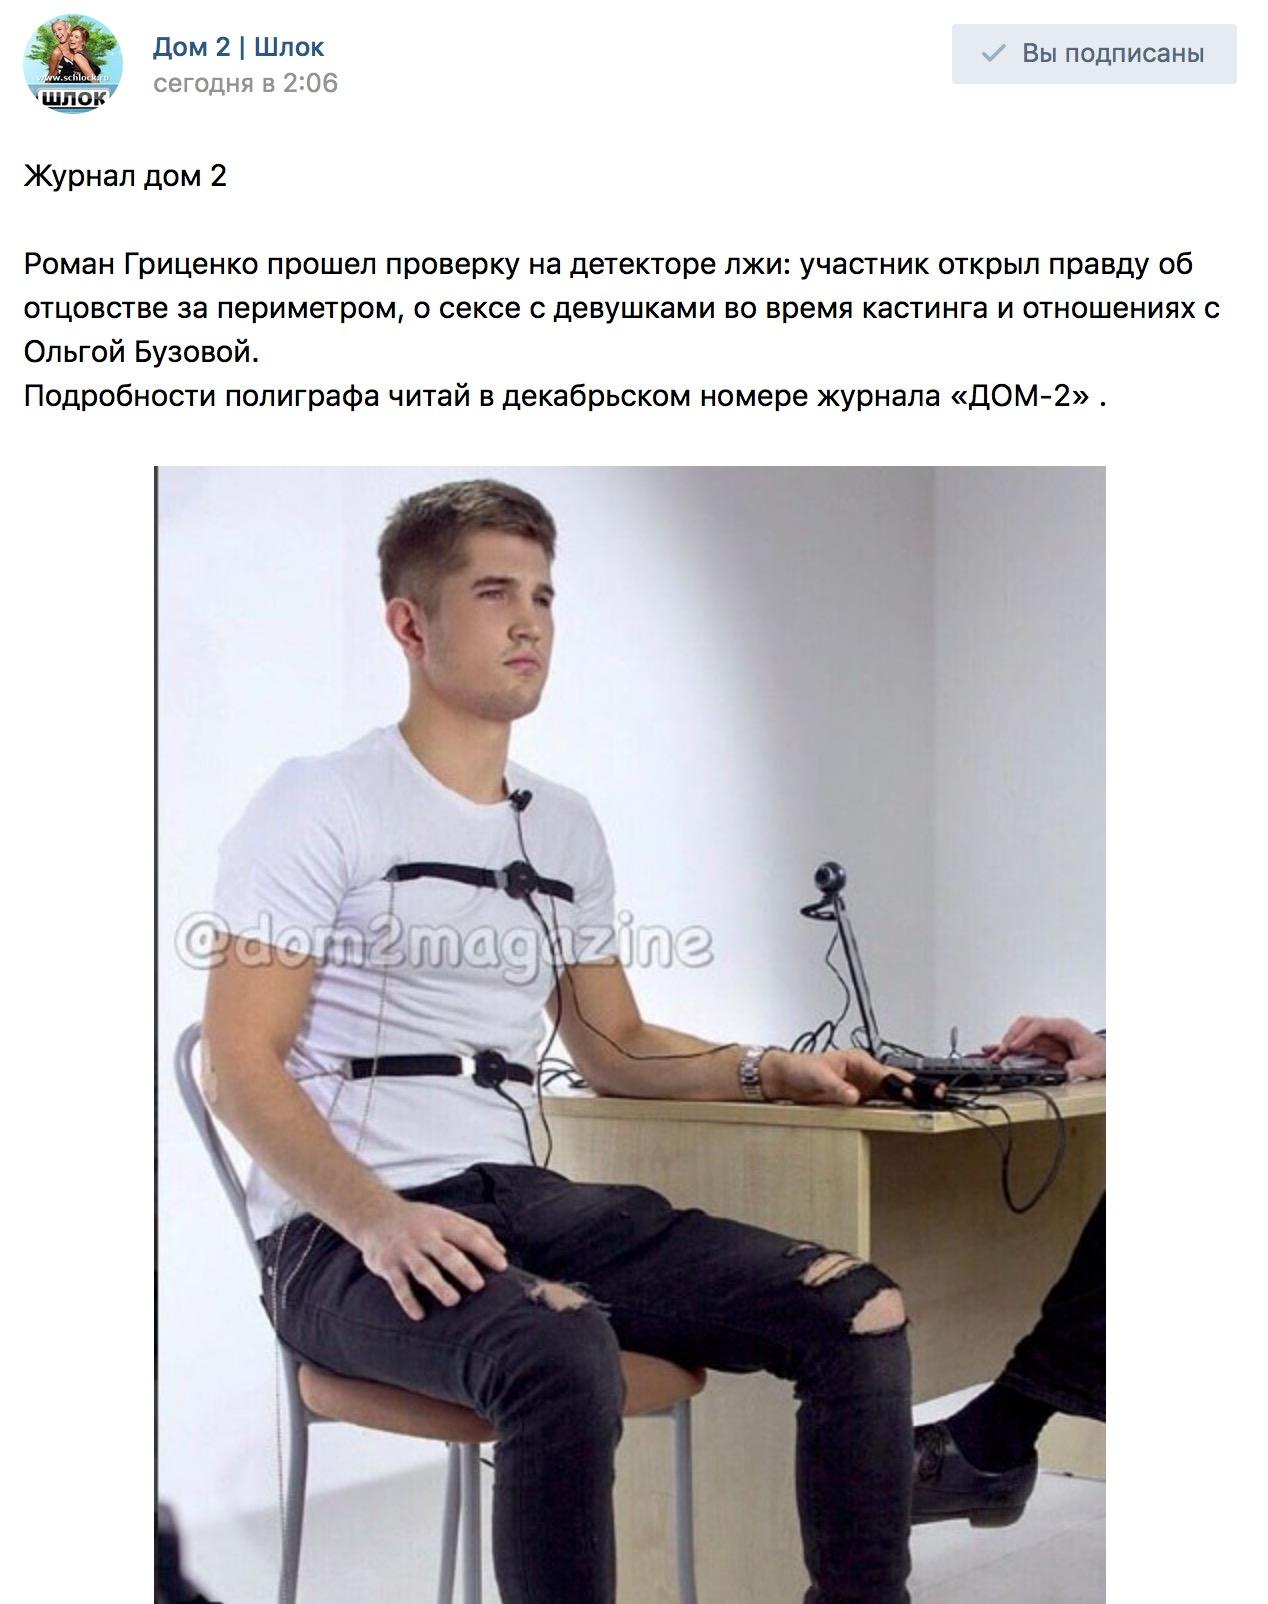 Роман Гриценко прошел проверку на детекторе лжи